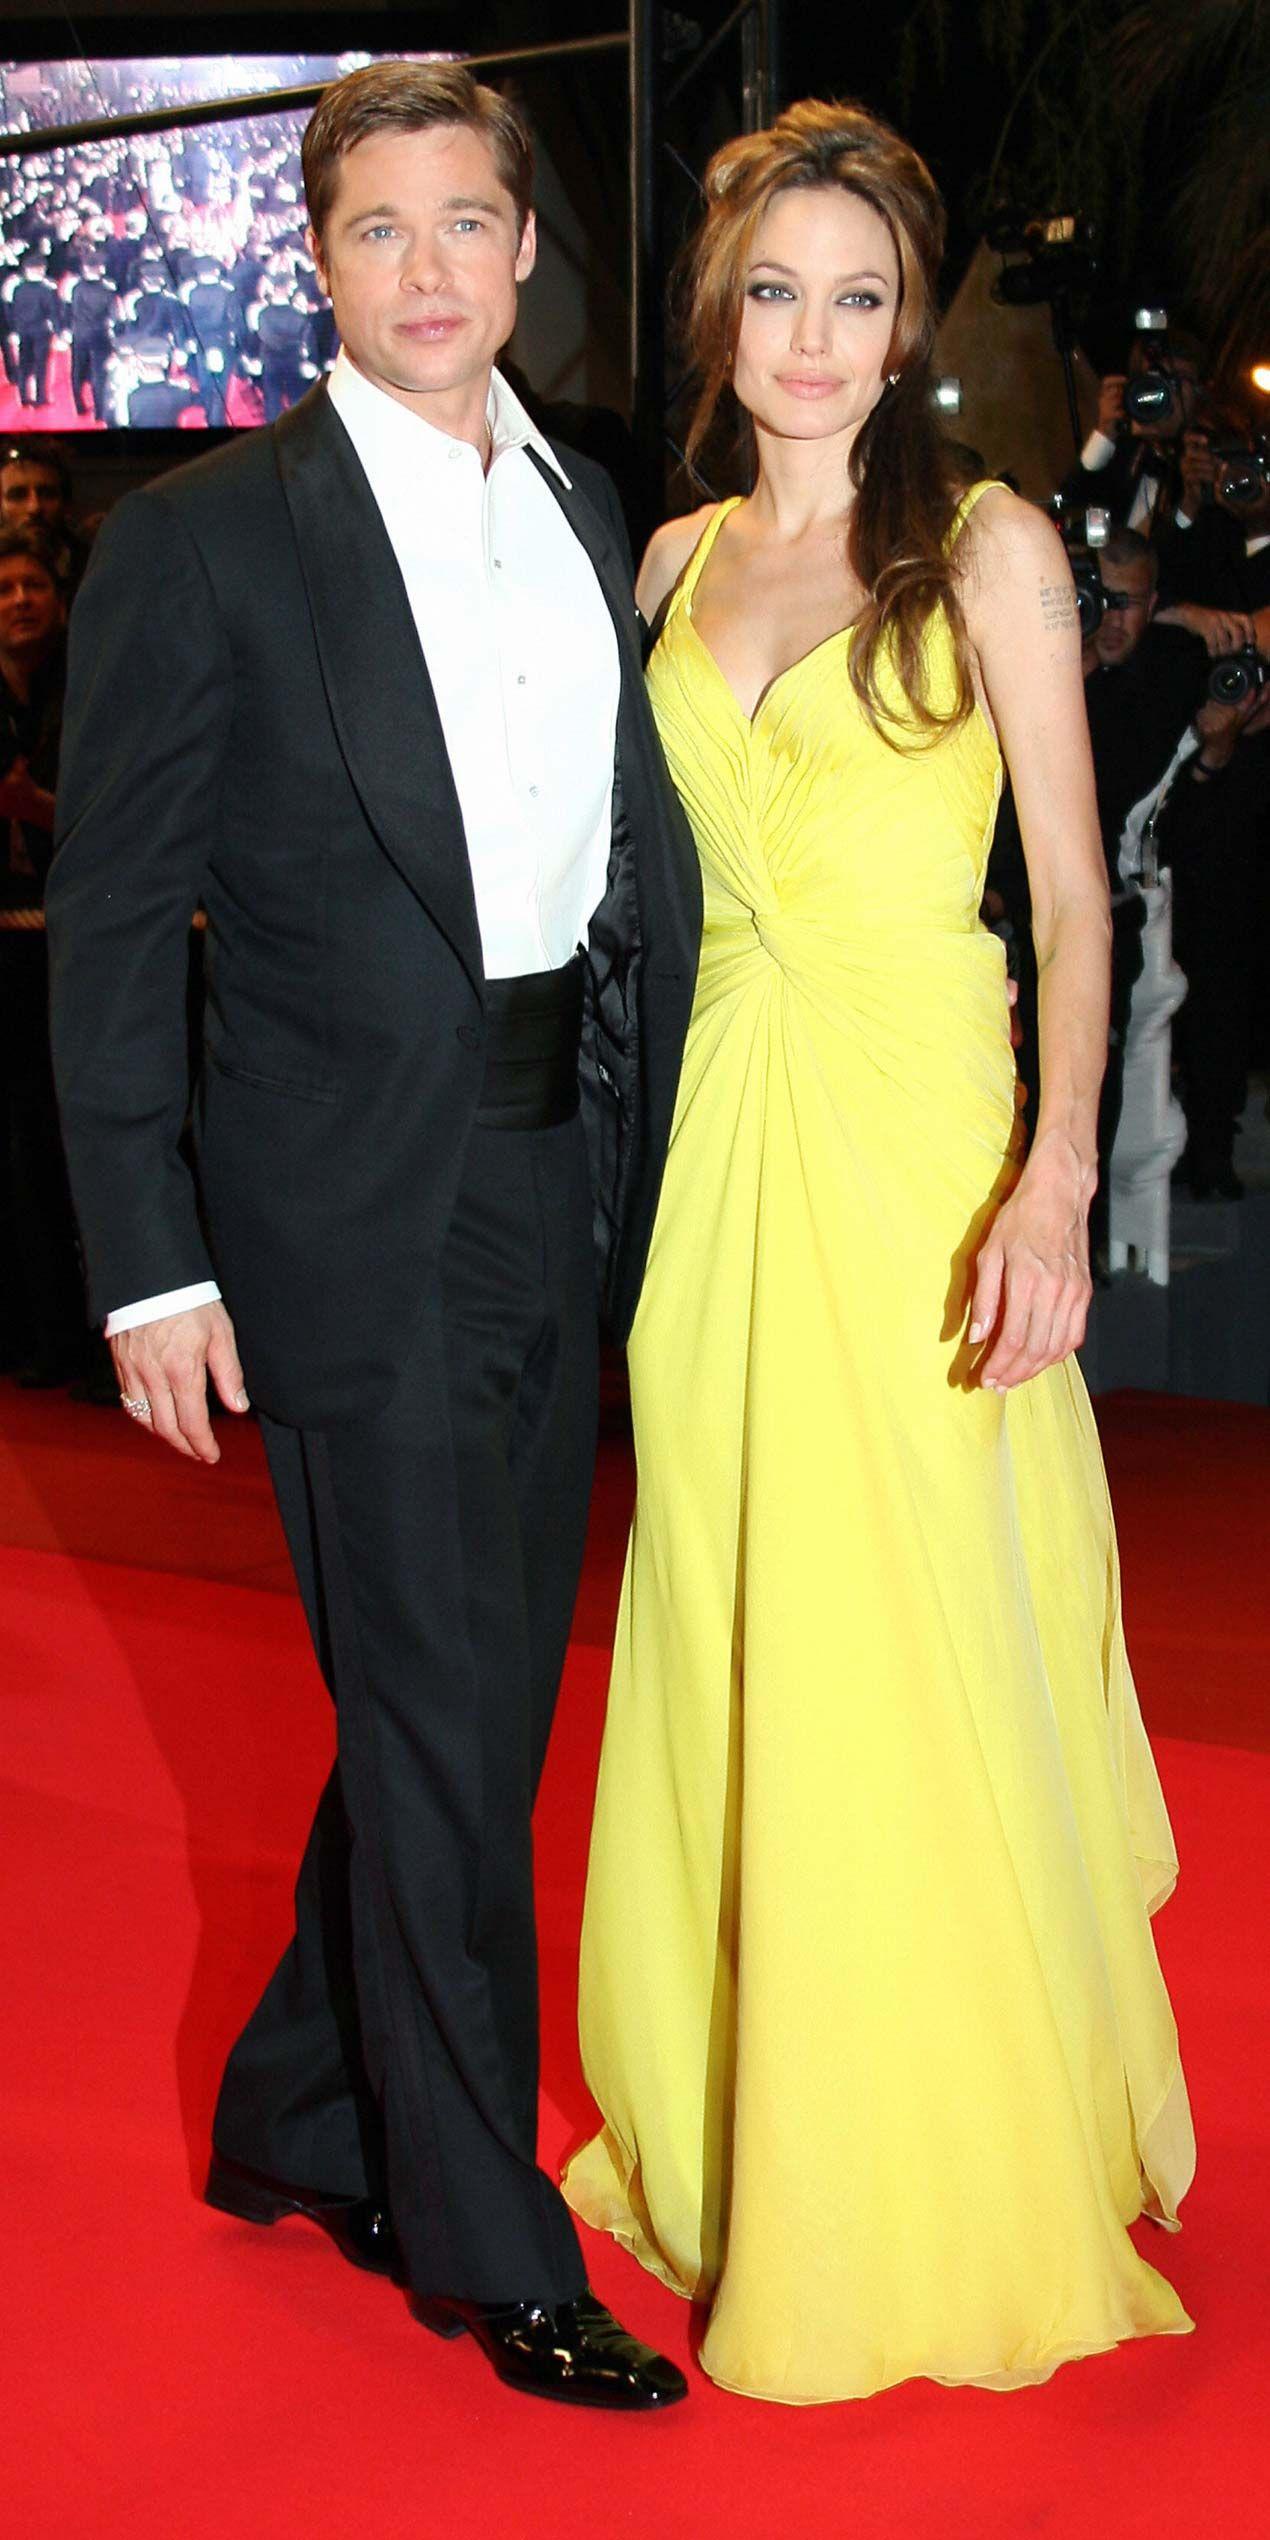 Brad Pitt And Angelina Jolie S Cutest Couple Moments Brad Pitt And Angelina Jolie Angelina Jolie Photos Brad And Angelina